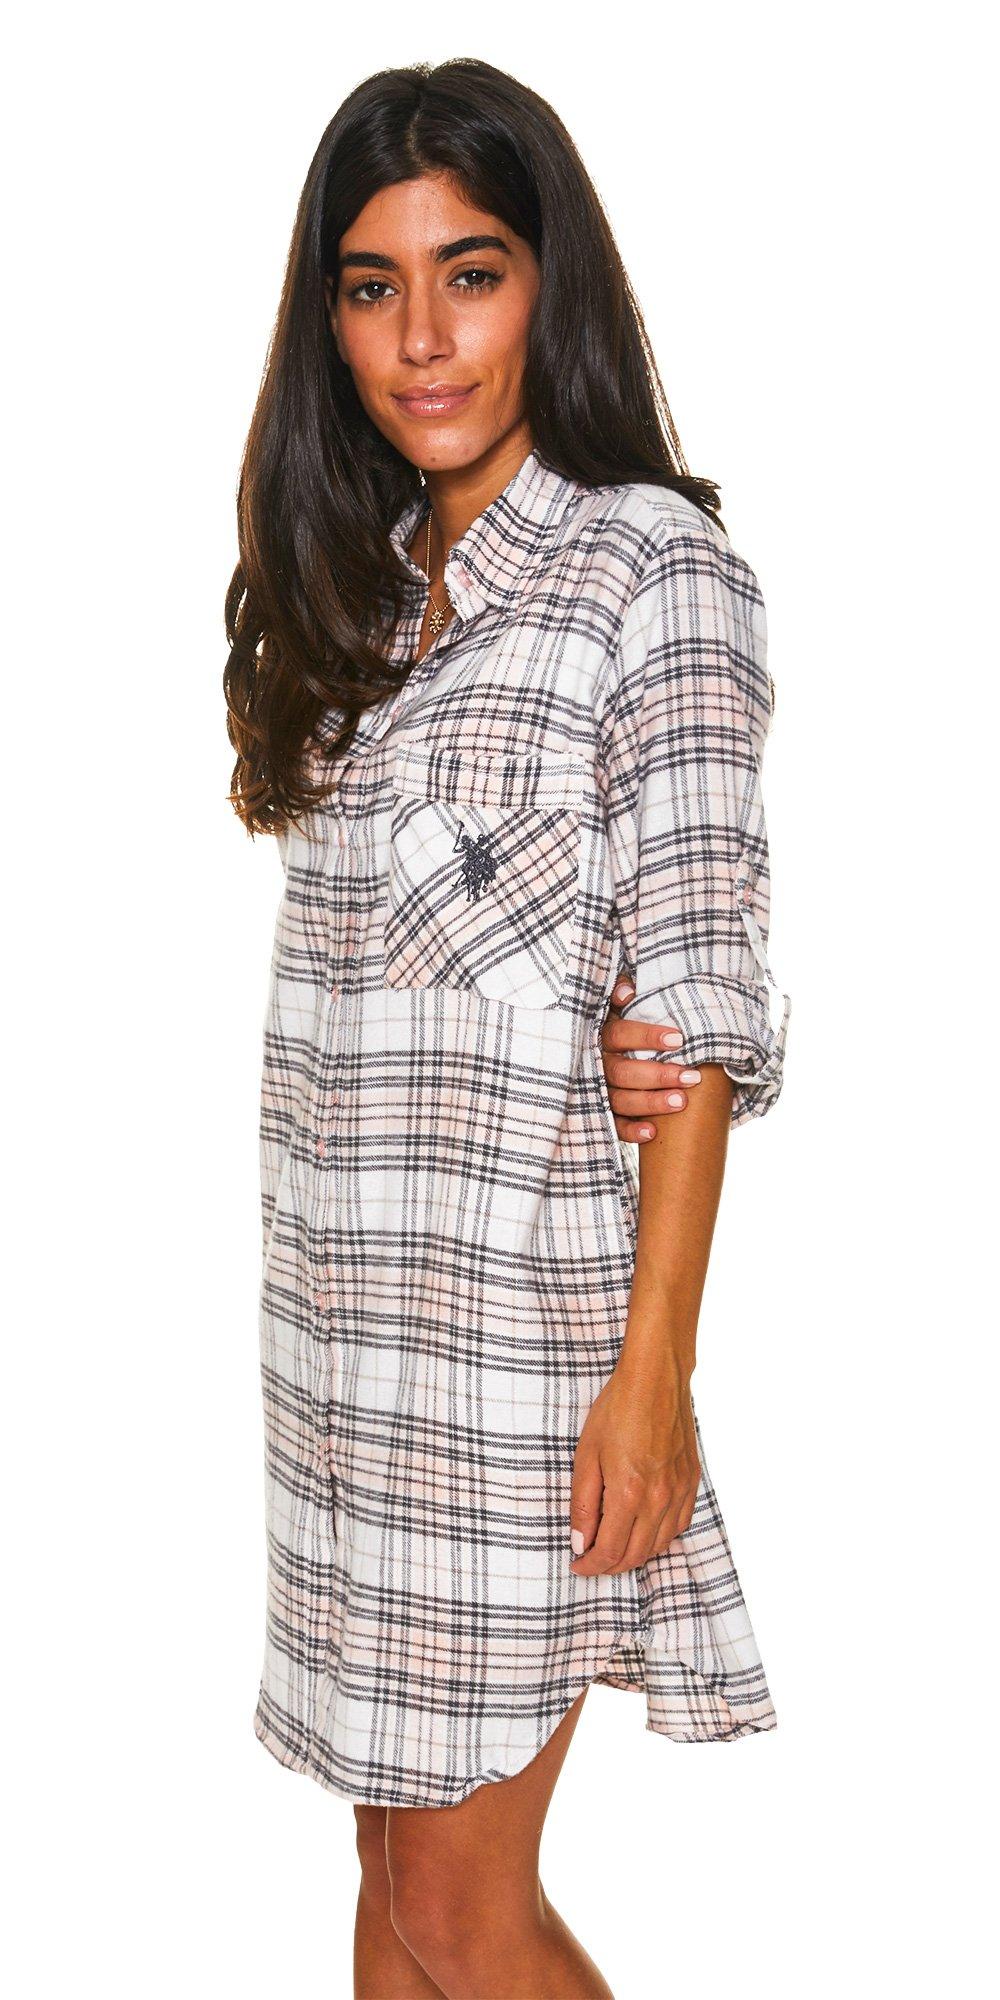 U.S. Polo Assn.. Womens Button Front Long Sleeve Cotton Pajama Sleep/Night Shirt White Large by U.S. Polo Assn. (Image #1)